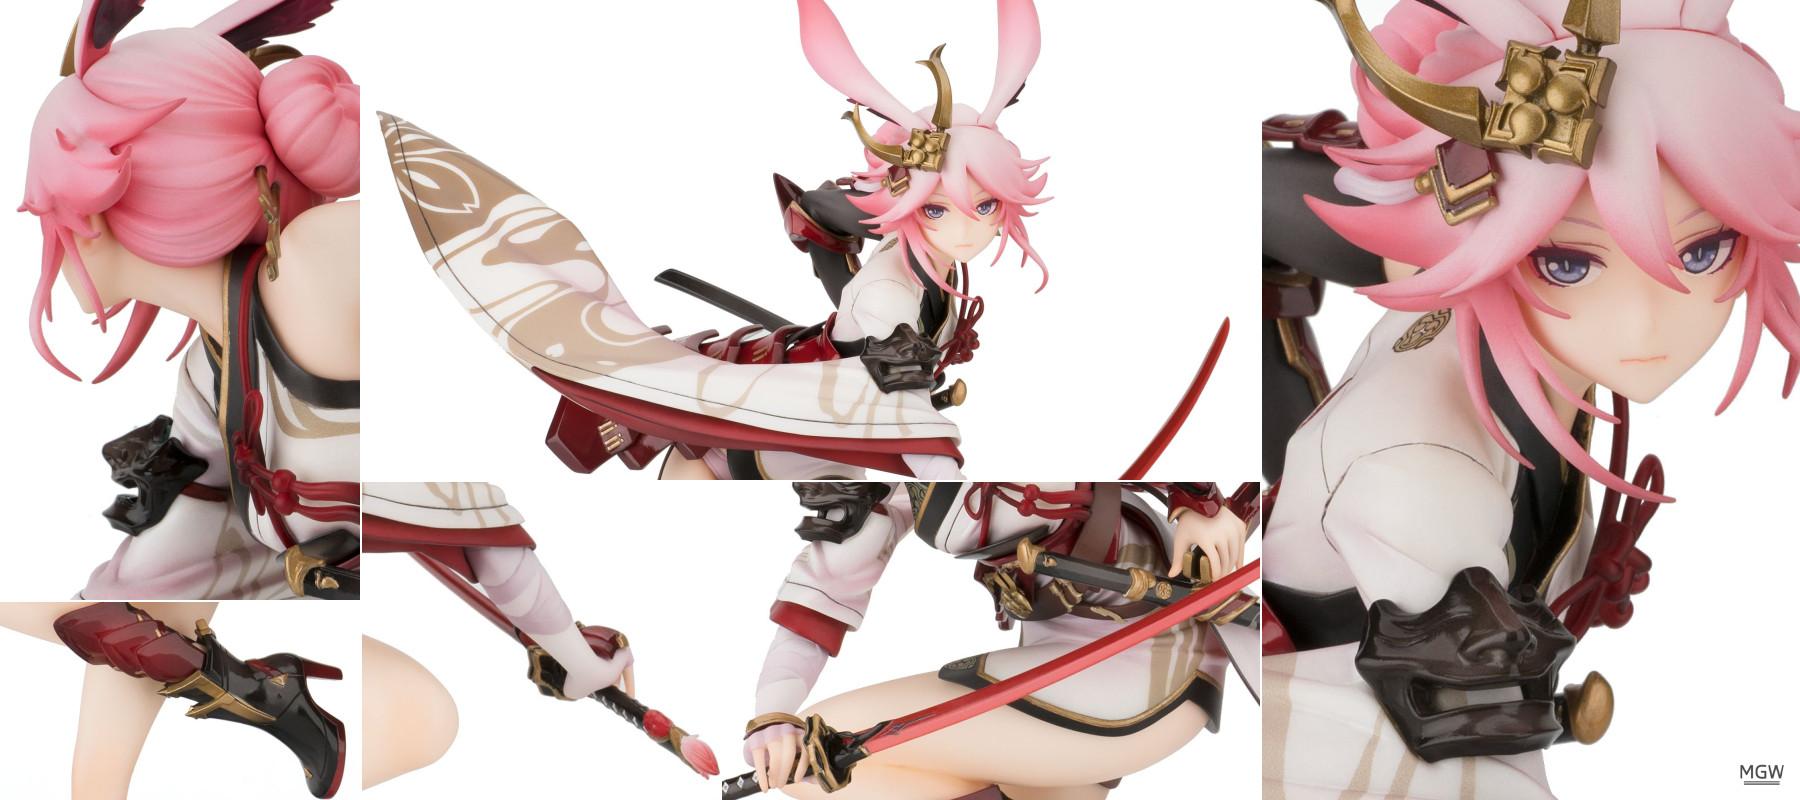 Yae Sakura by MiHoYo from Houkai 3rd MyGrailWatch Header